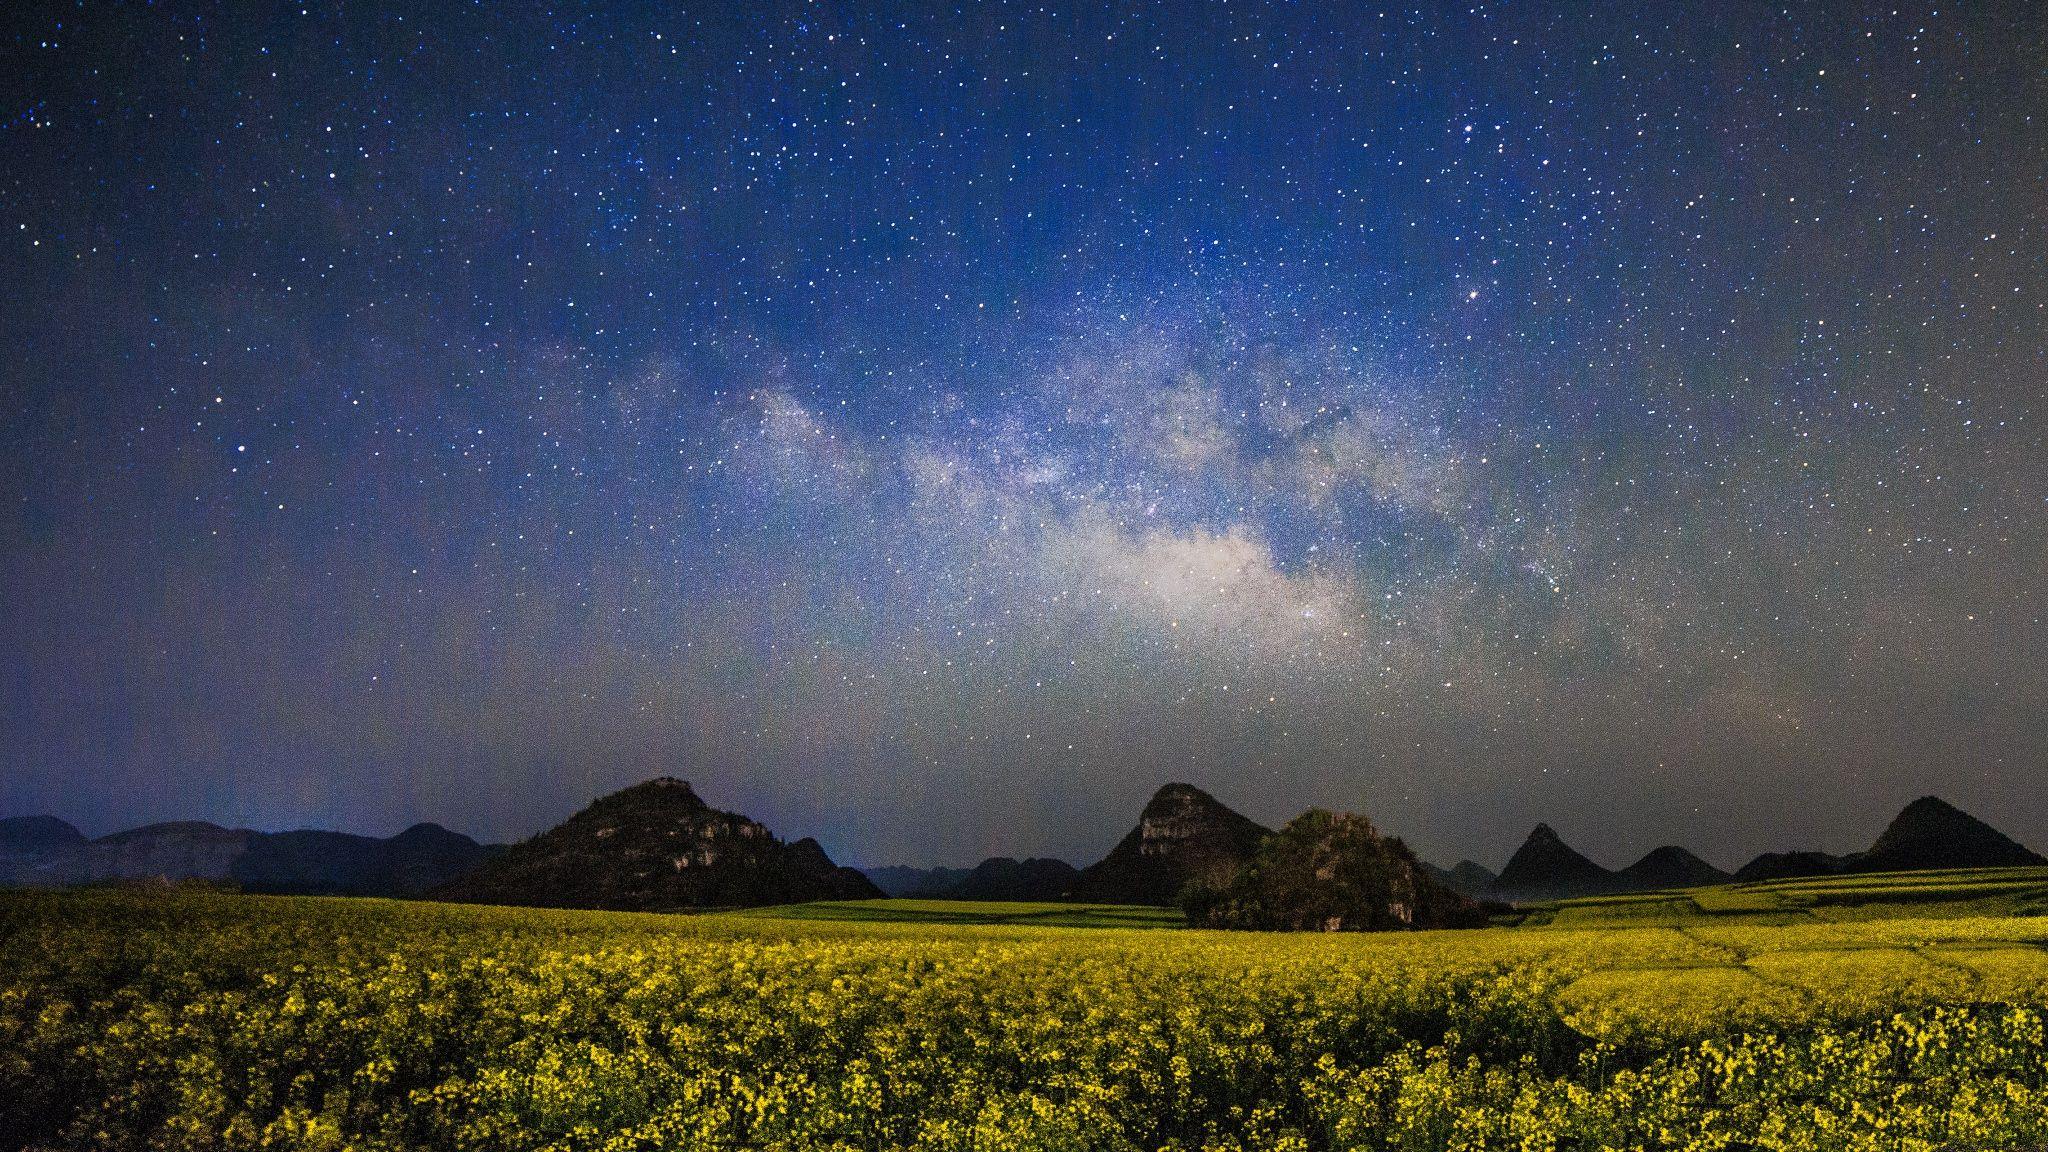 Luoping Galaxy by Rui Shu on 500px